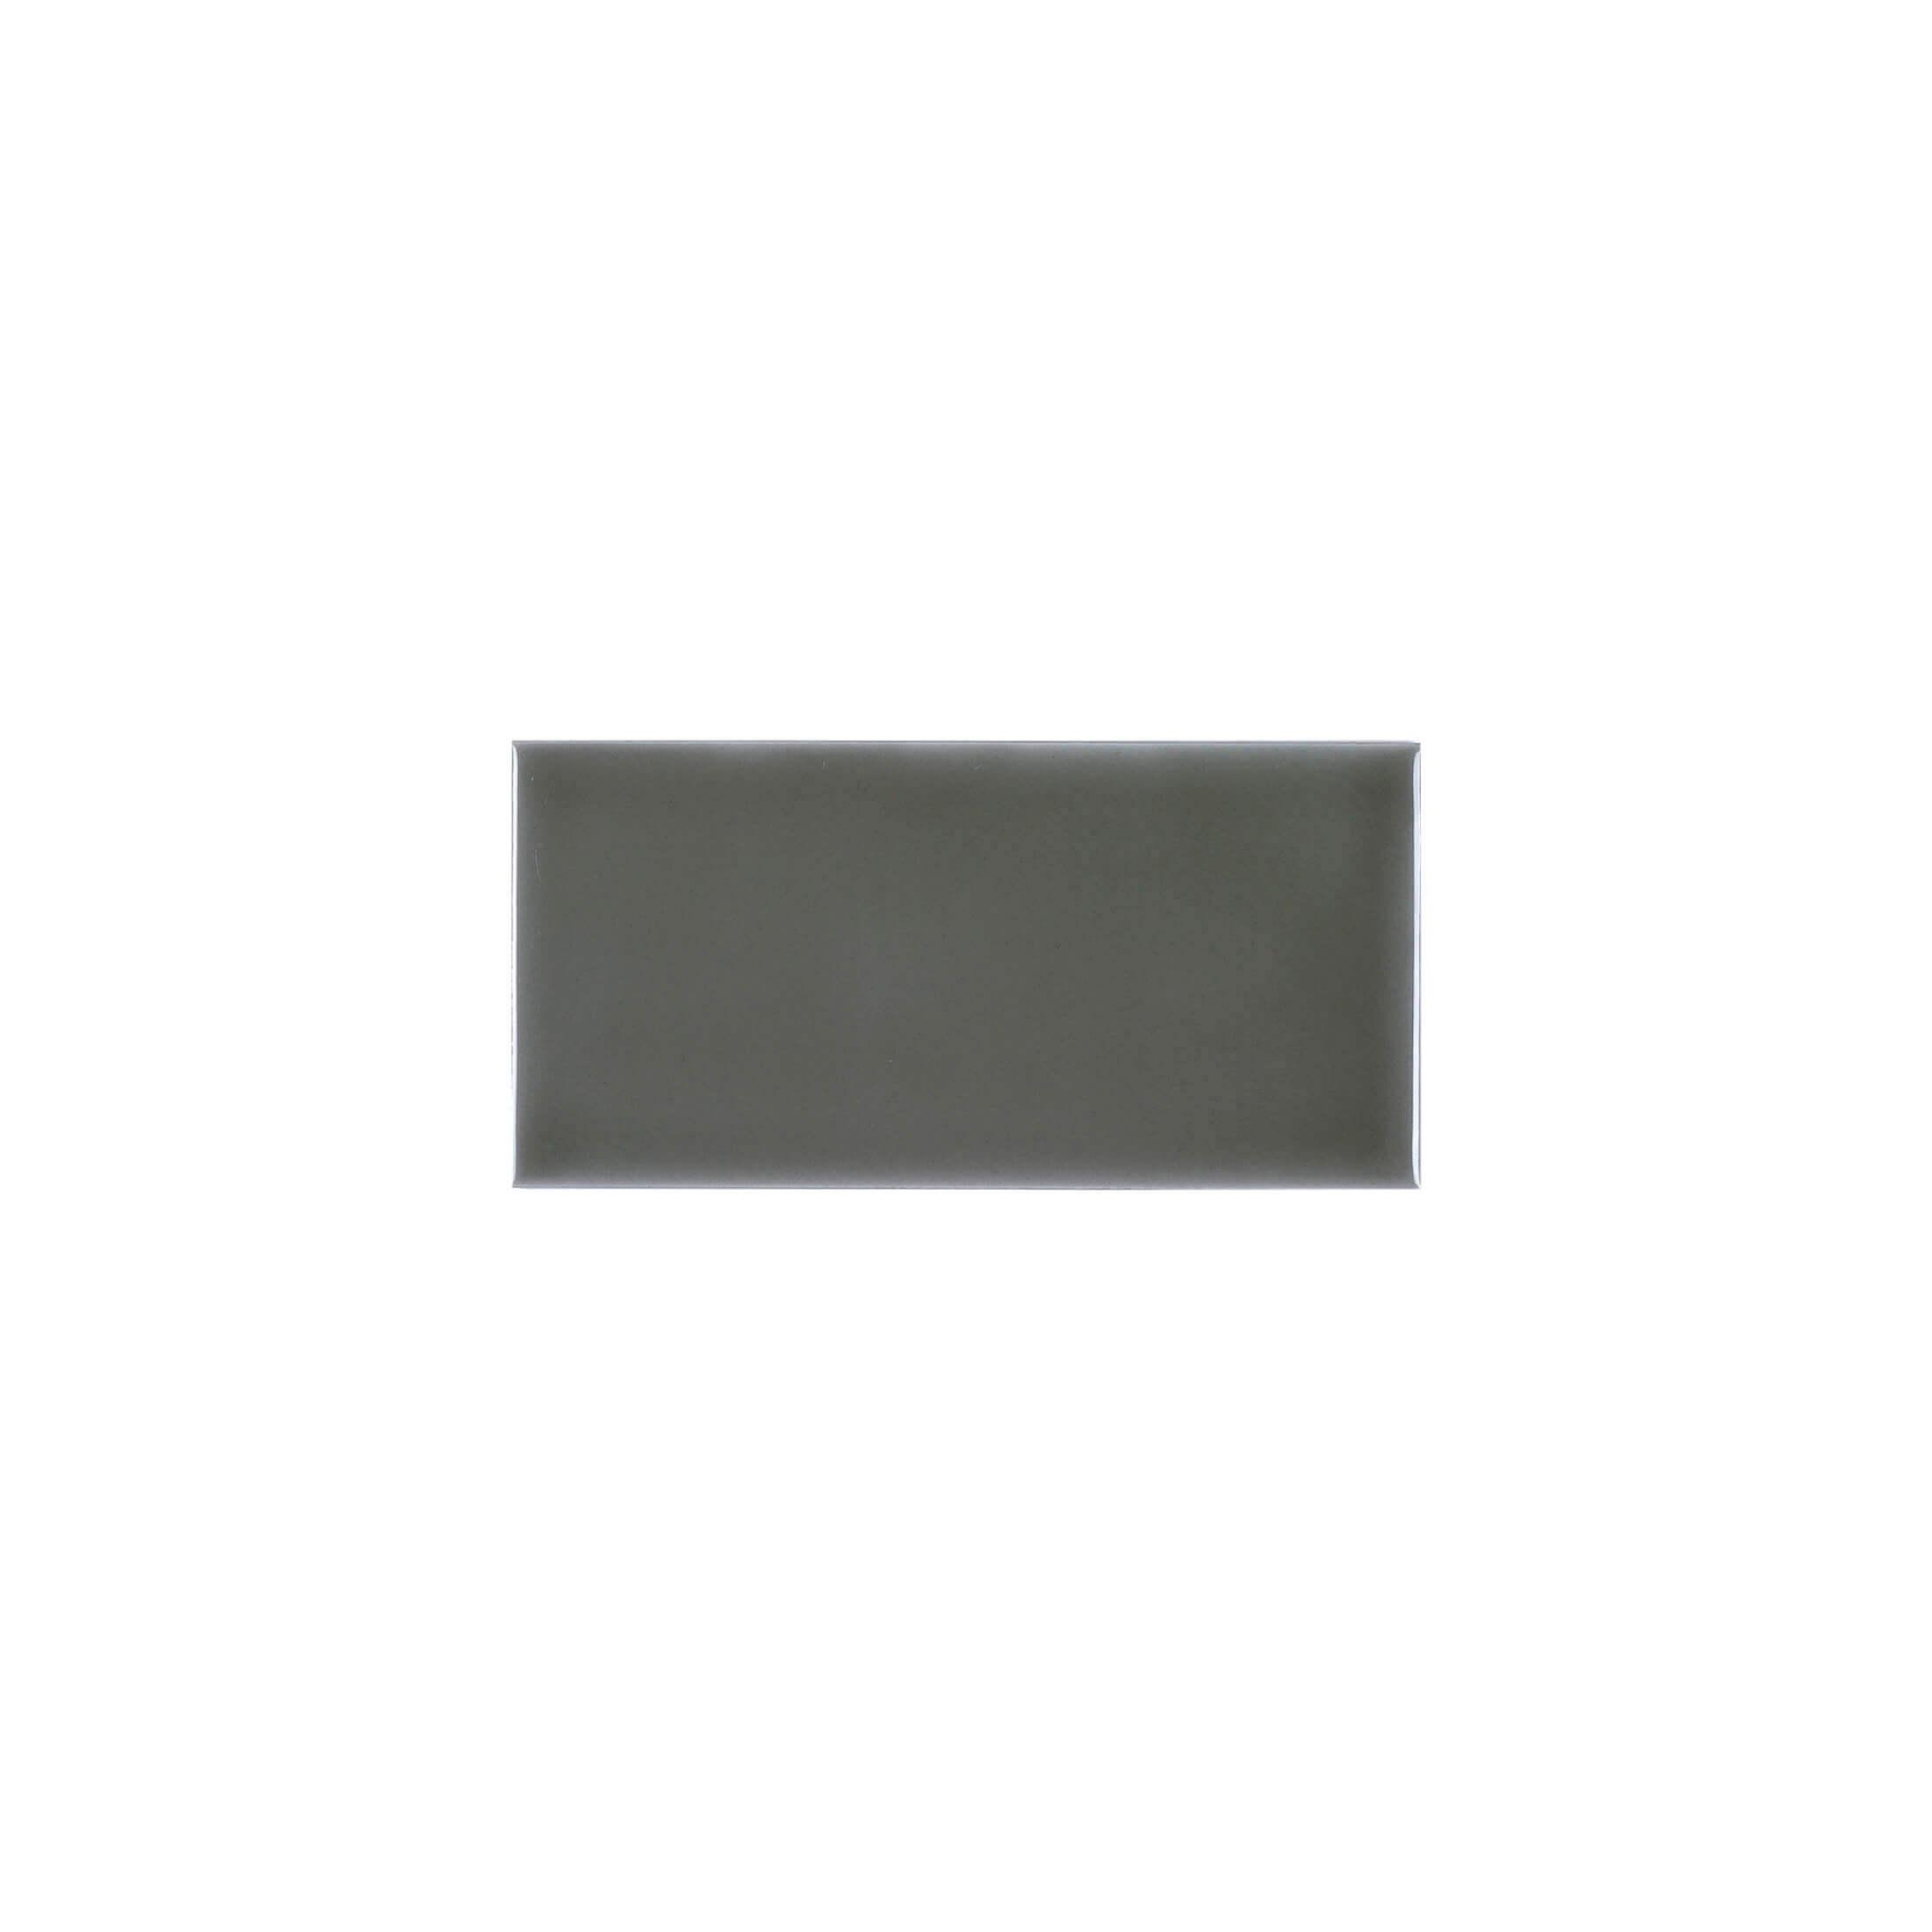 ADST1013 - LISO  - 7.3 cm X 14.8 cm